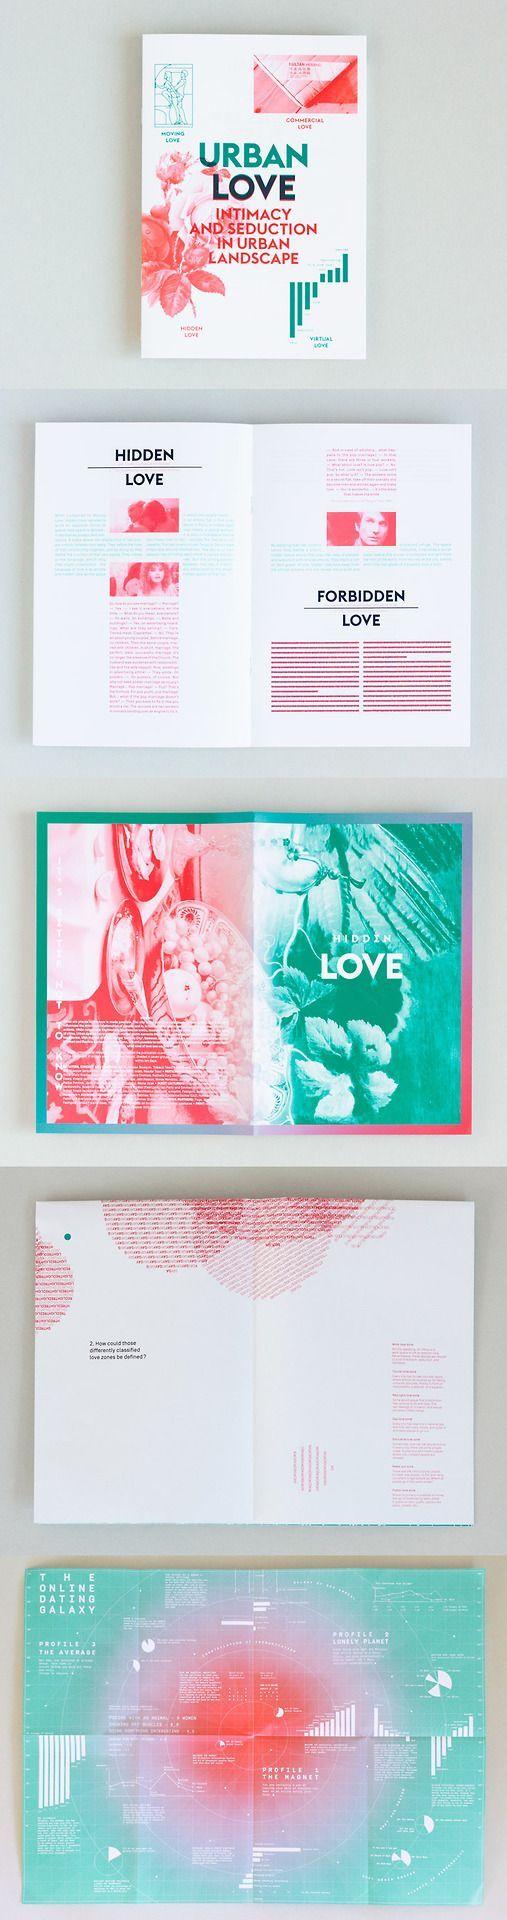 Cool Brand Identity Design. Urban Love. #branding #brandidentity [http://www.pinterest.com/alfredchong/]: